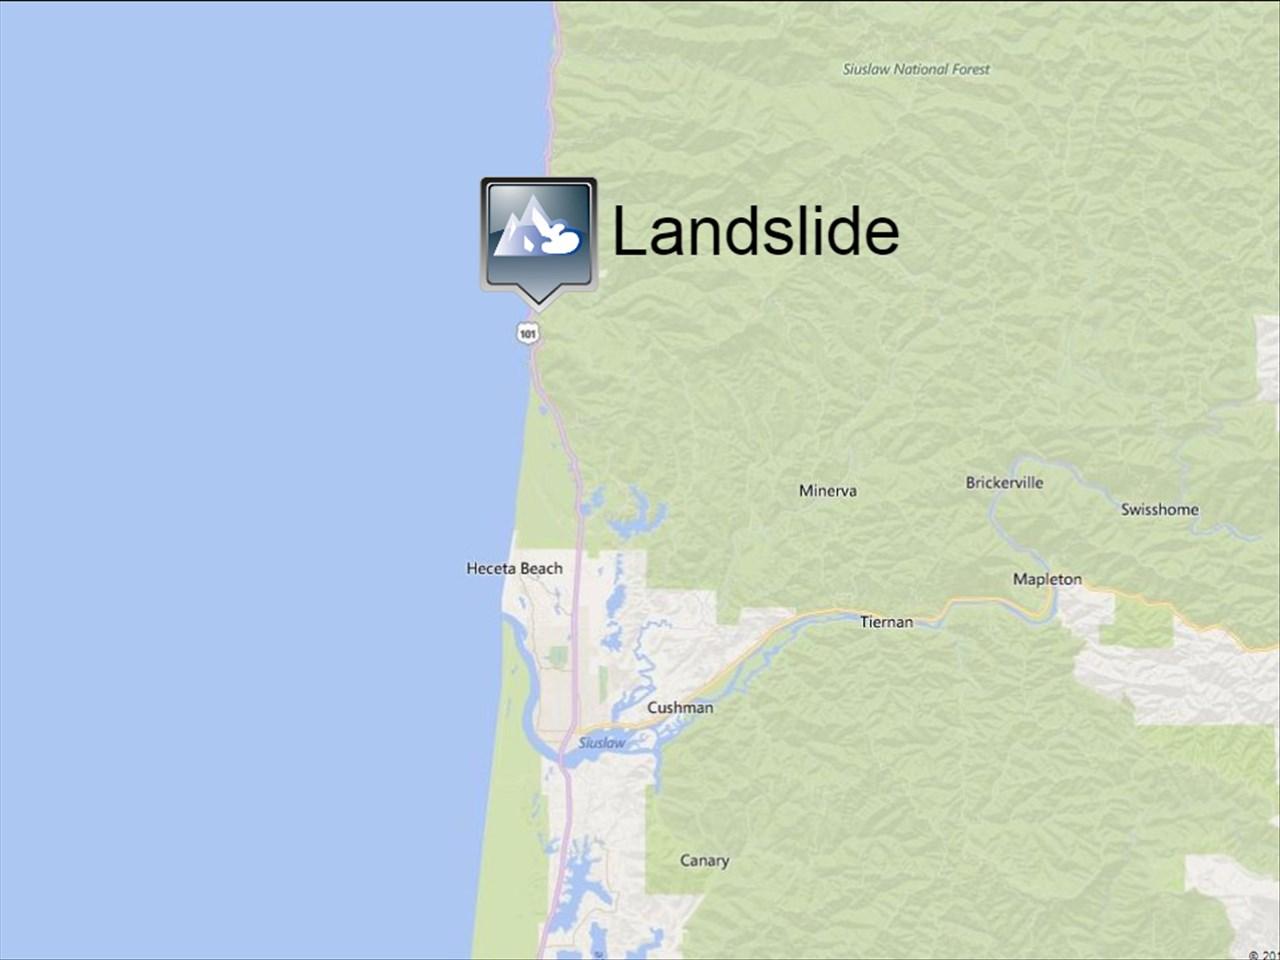 A Landslide Near Heceta Head Lighthouse State Park Closed U S 101 Until Further Notice Sunday